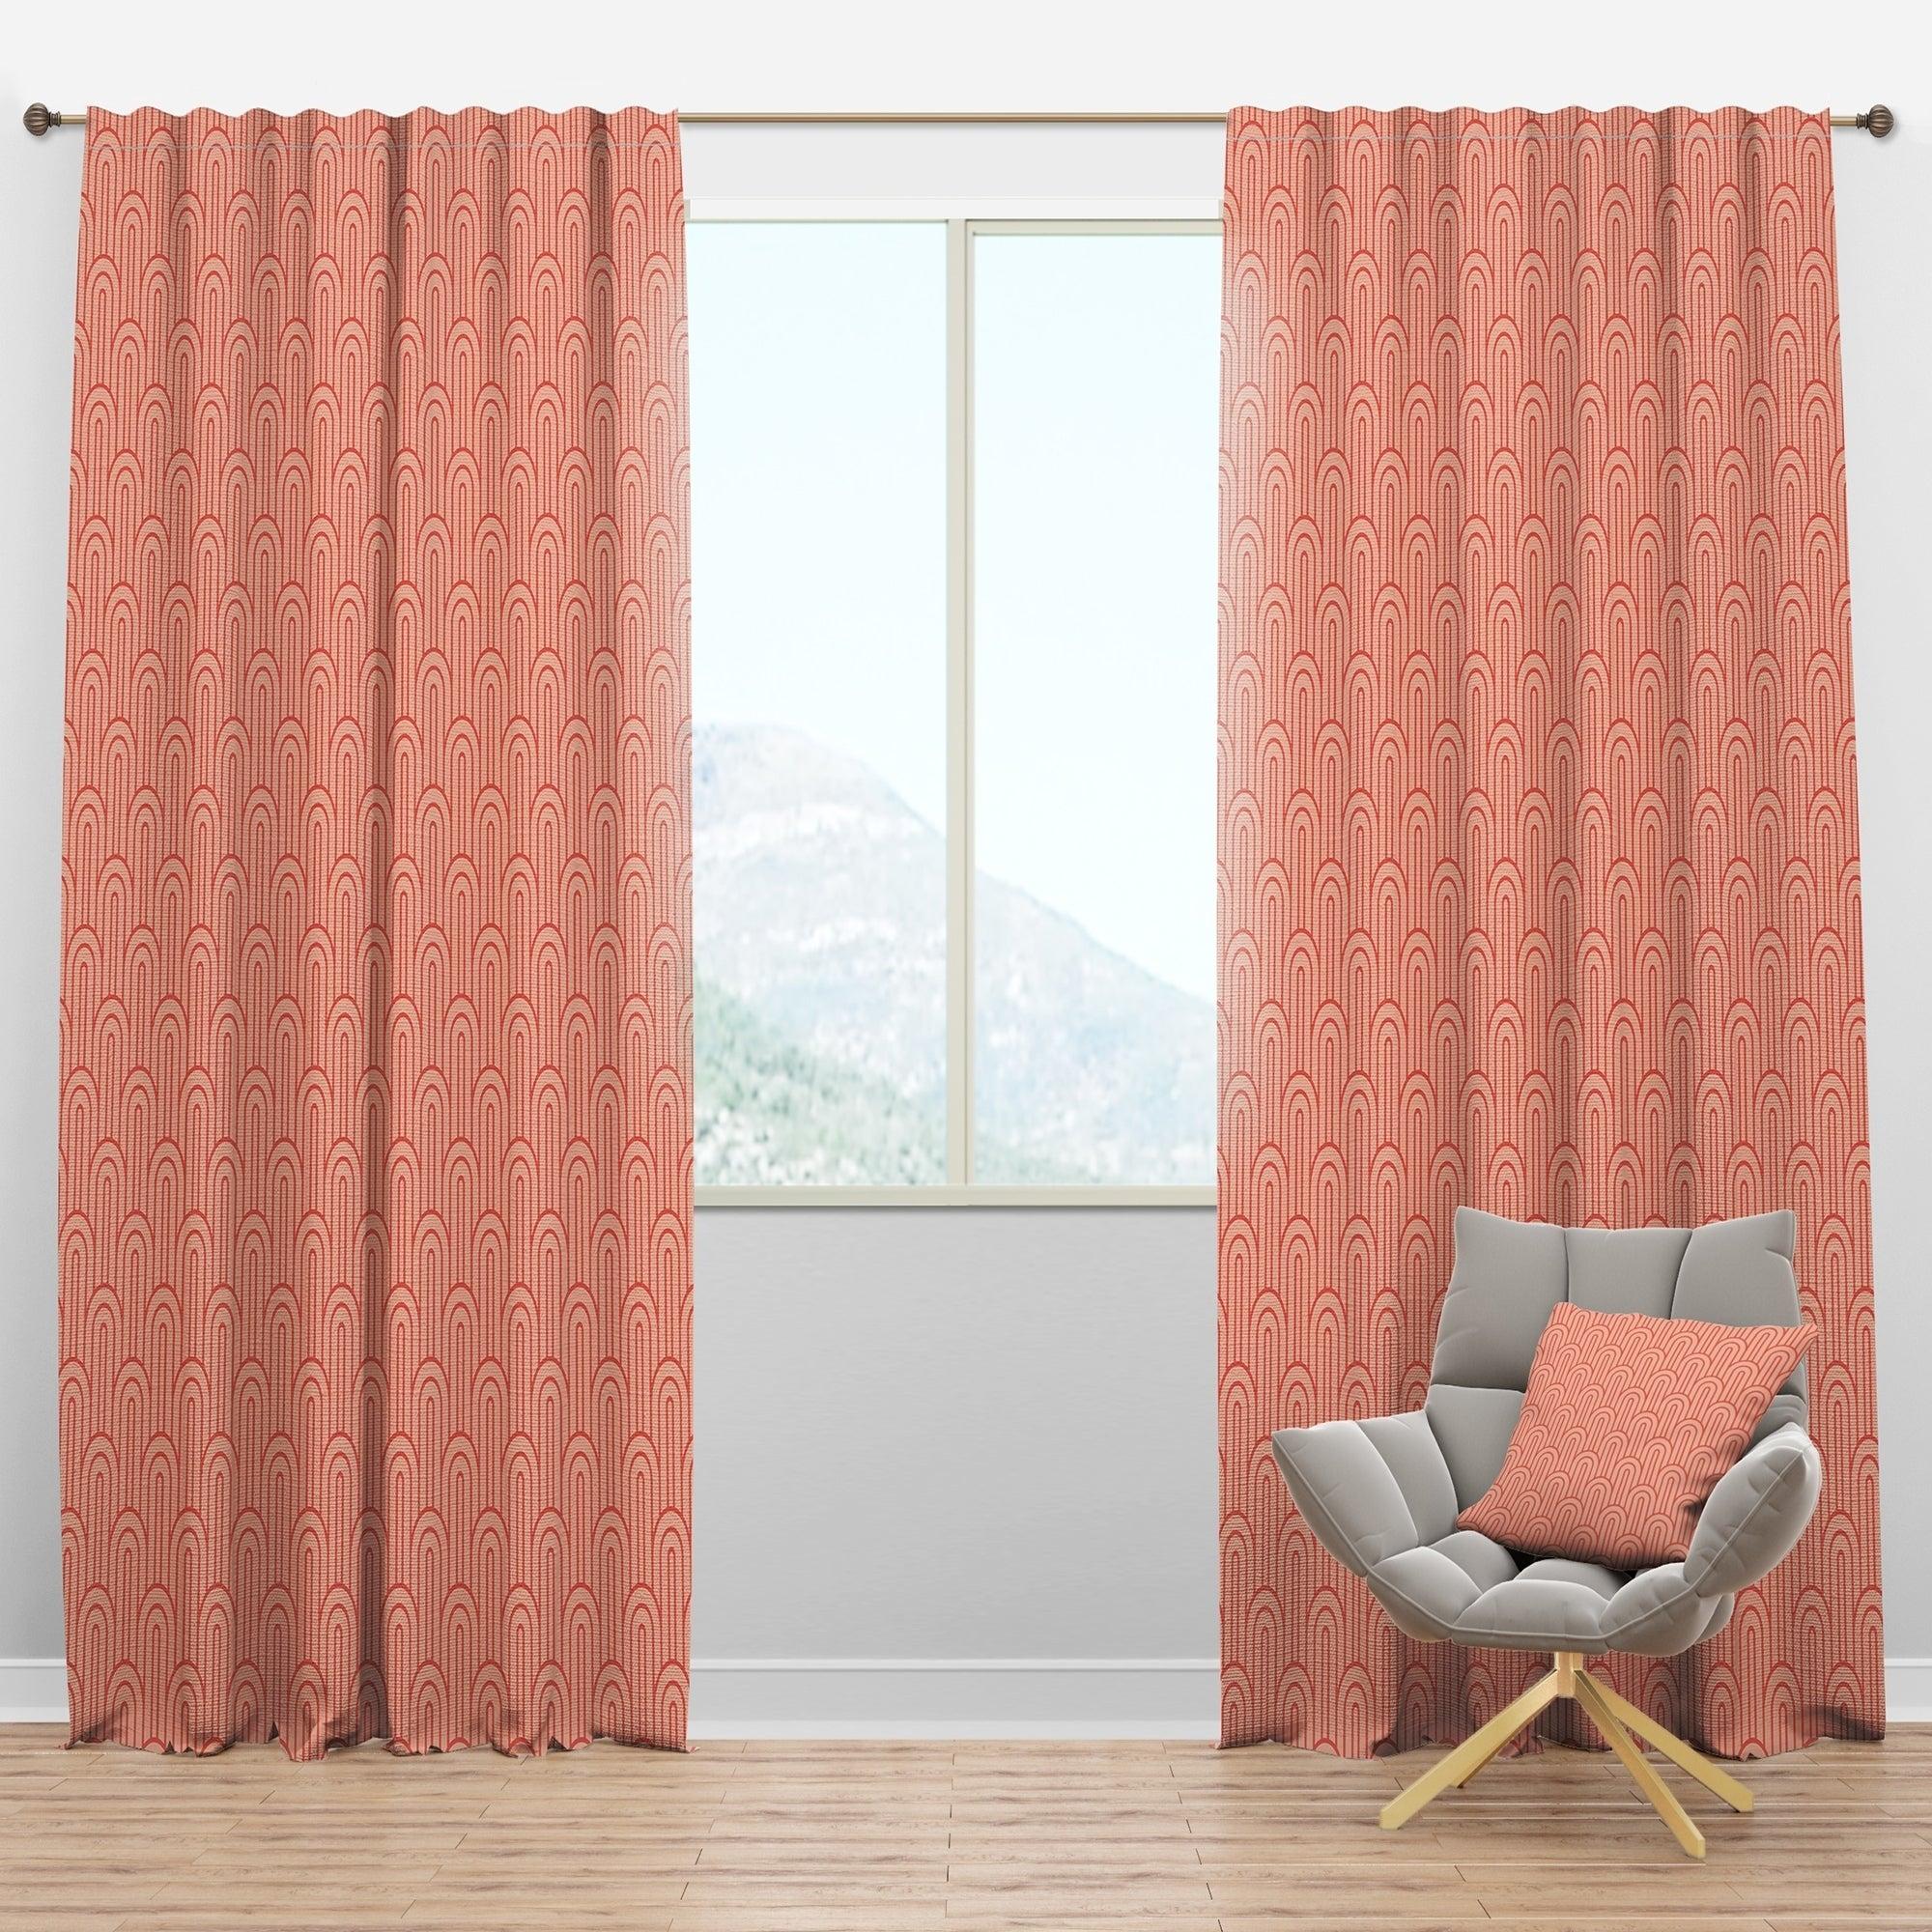 Designart Retro Art Deco Waves Ii Mid Century Modern Curtain Panels